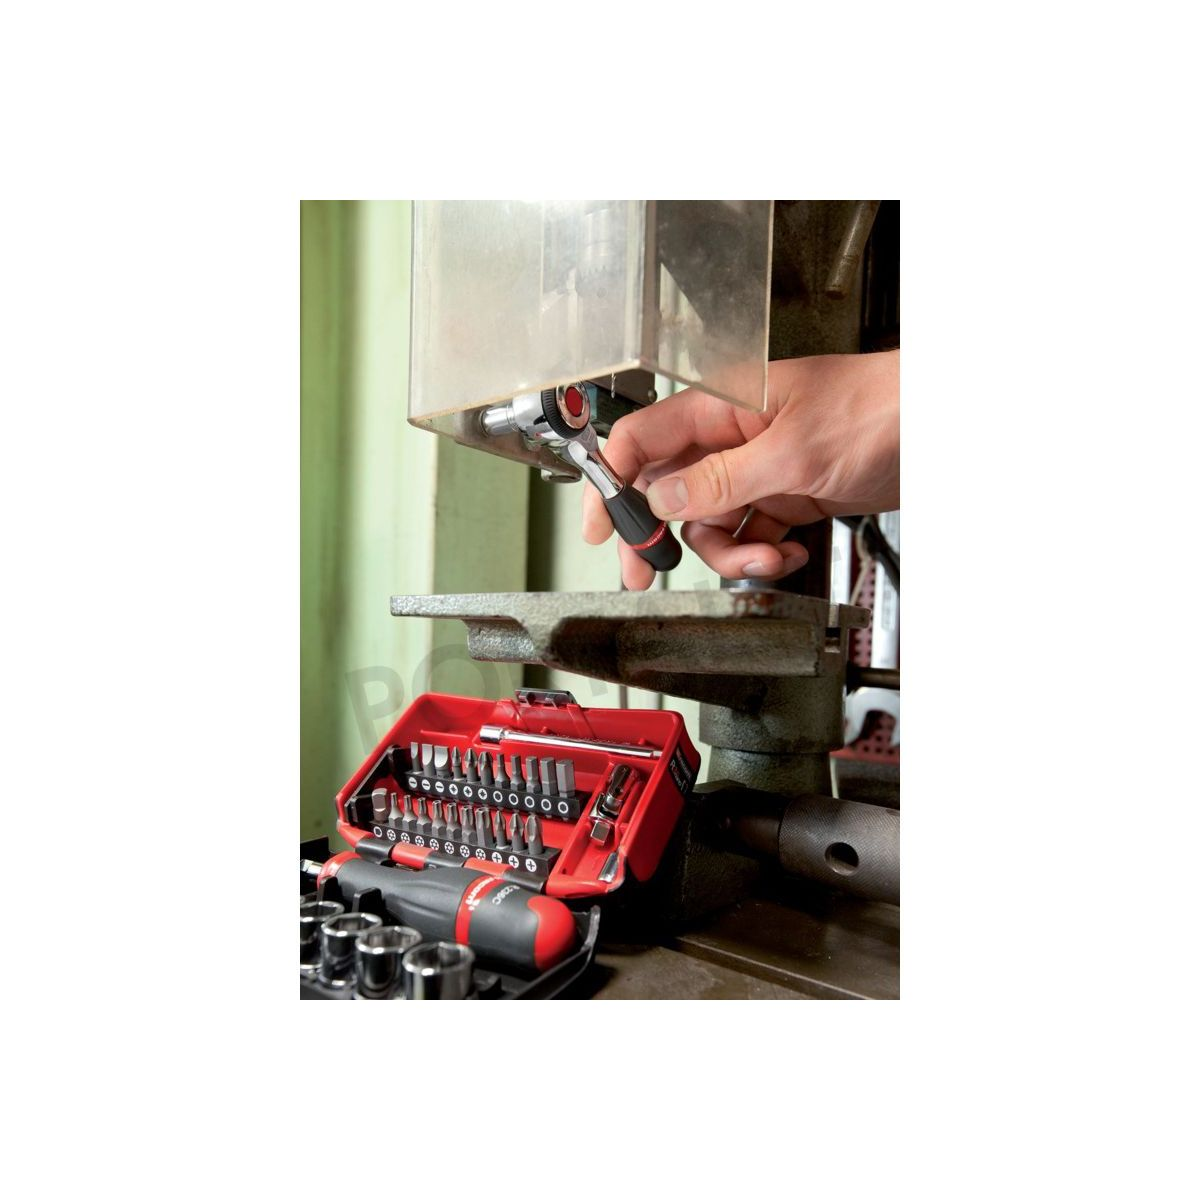 Achetez le coffret Cliquet 1 4 manche rotatif R.360NANO FACOM. e93dce0cd559